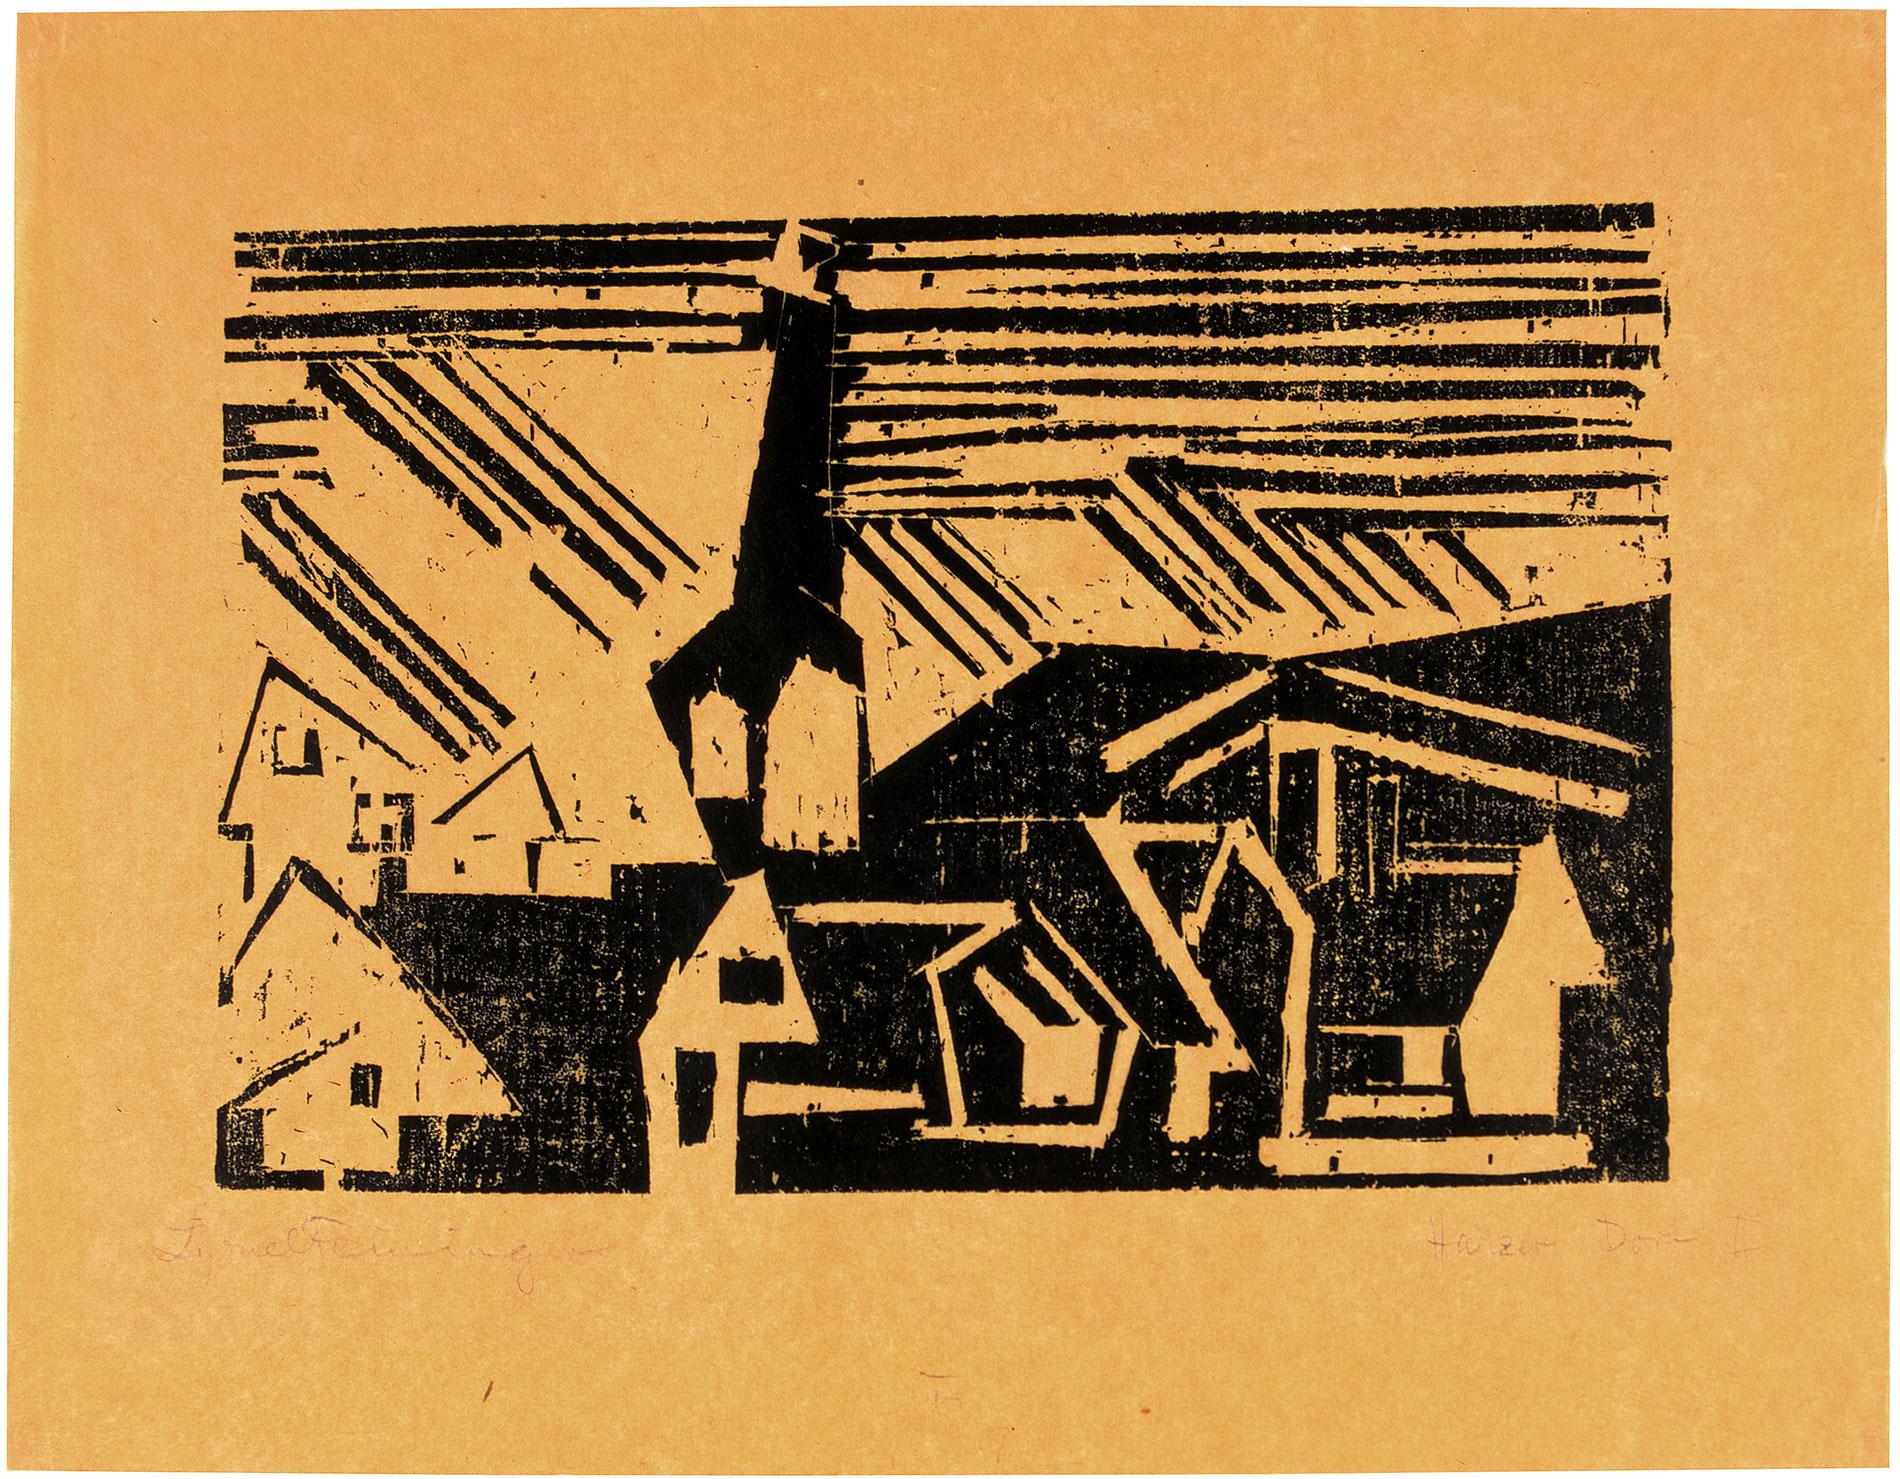 Lyonel Feininger, Harzer Dorf II, 1918, 25,4×32,2 cm; Kunstsammlungen Chemnitz